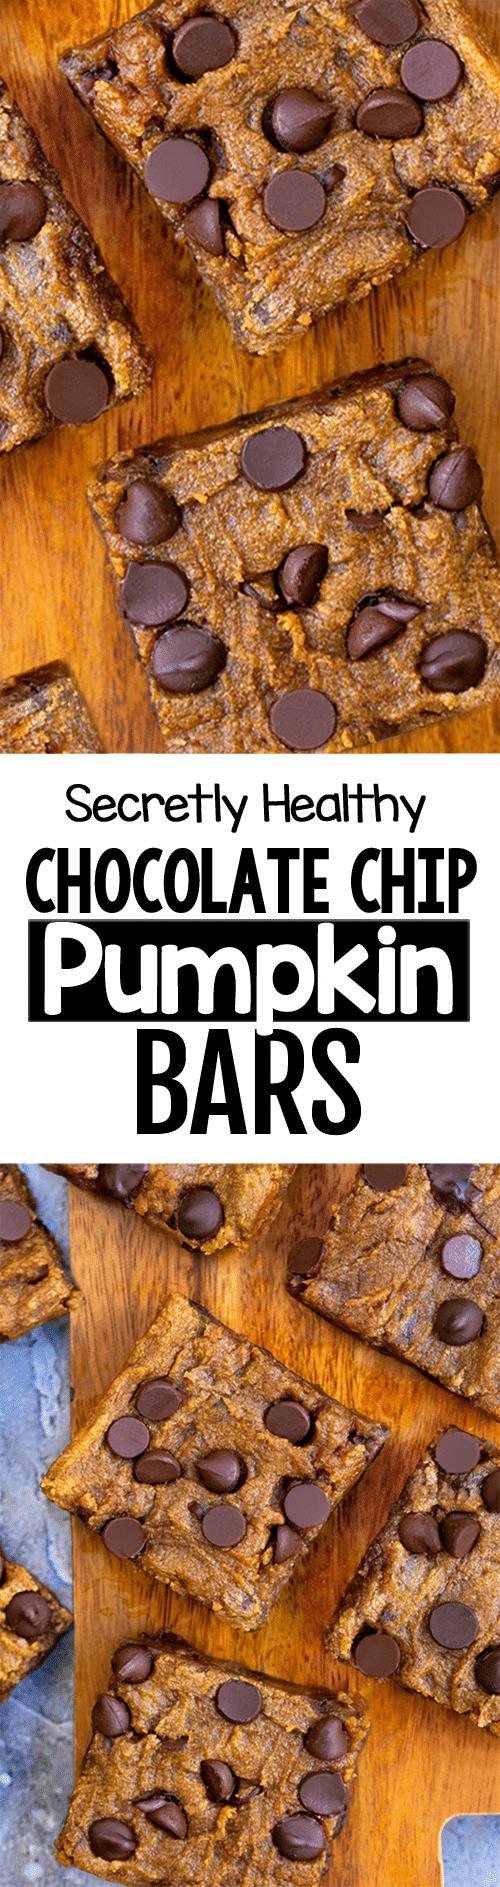 Easy Vegan Chocolate Chip Pumpkin Cookie Bars Recipe